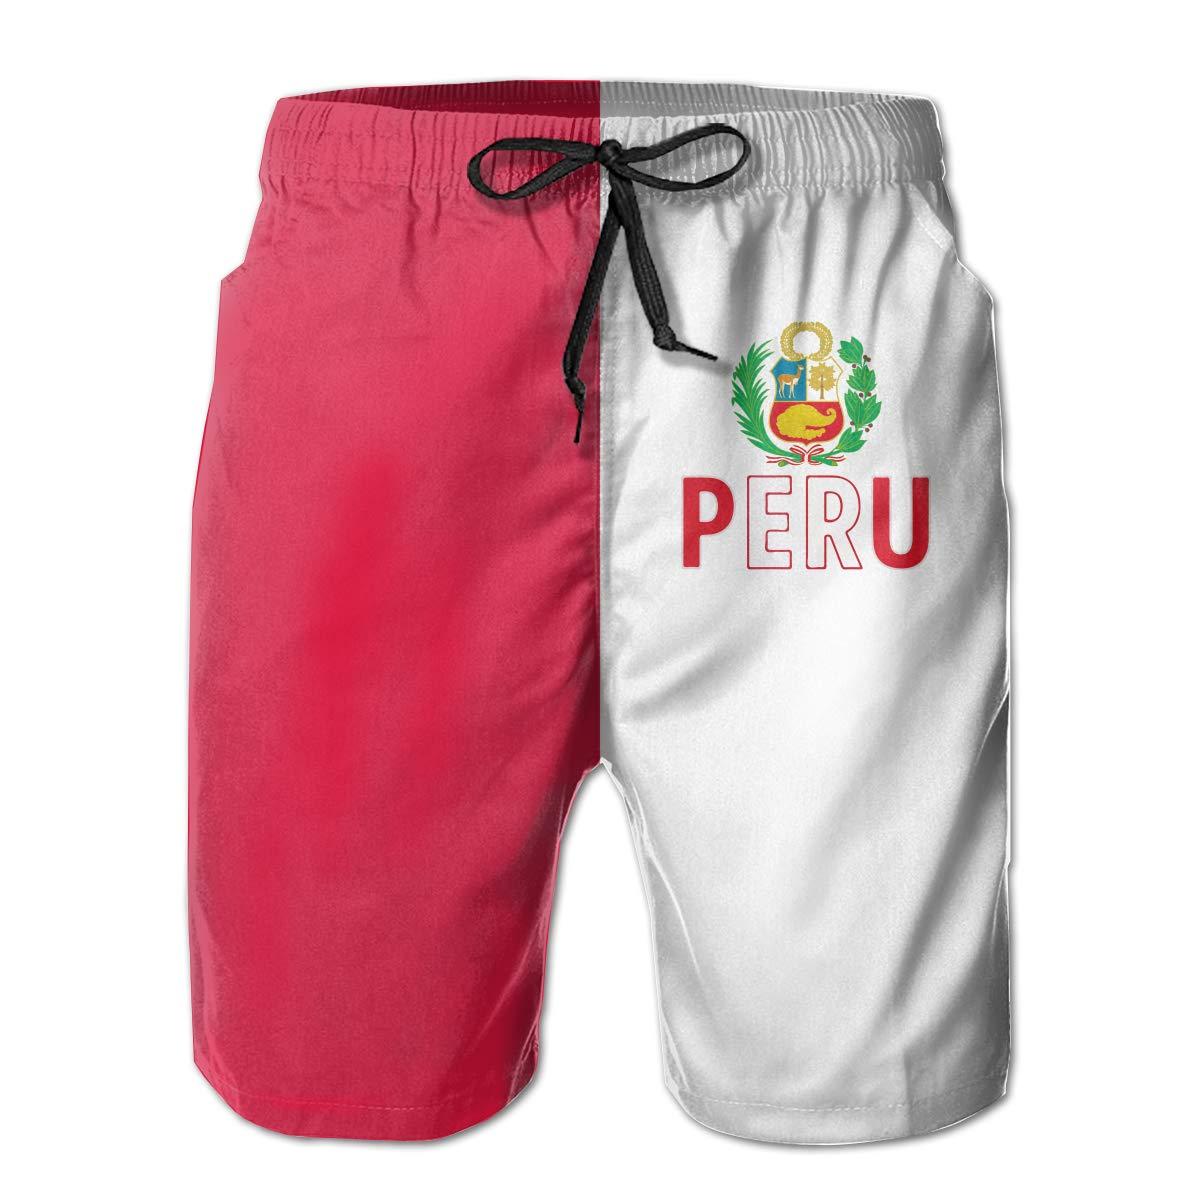 Polyester Peru Flag Peruvian Board Shorts with Pockets Xk7@KU Mens Casual Swim Trunks